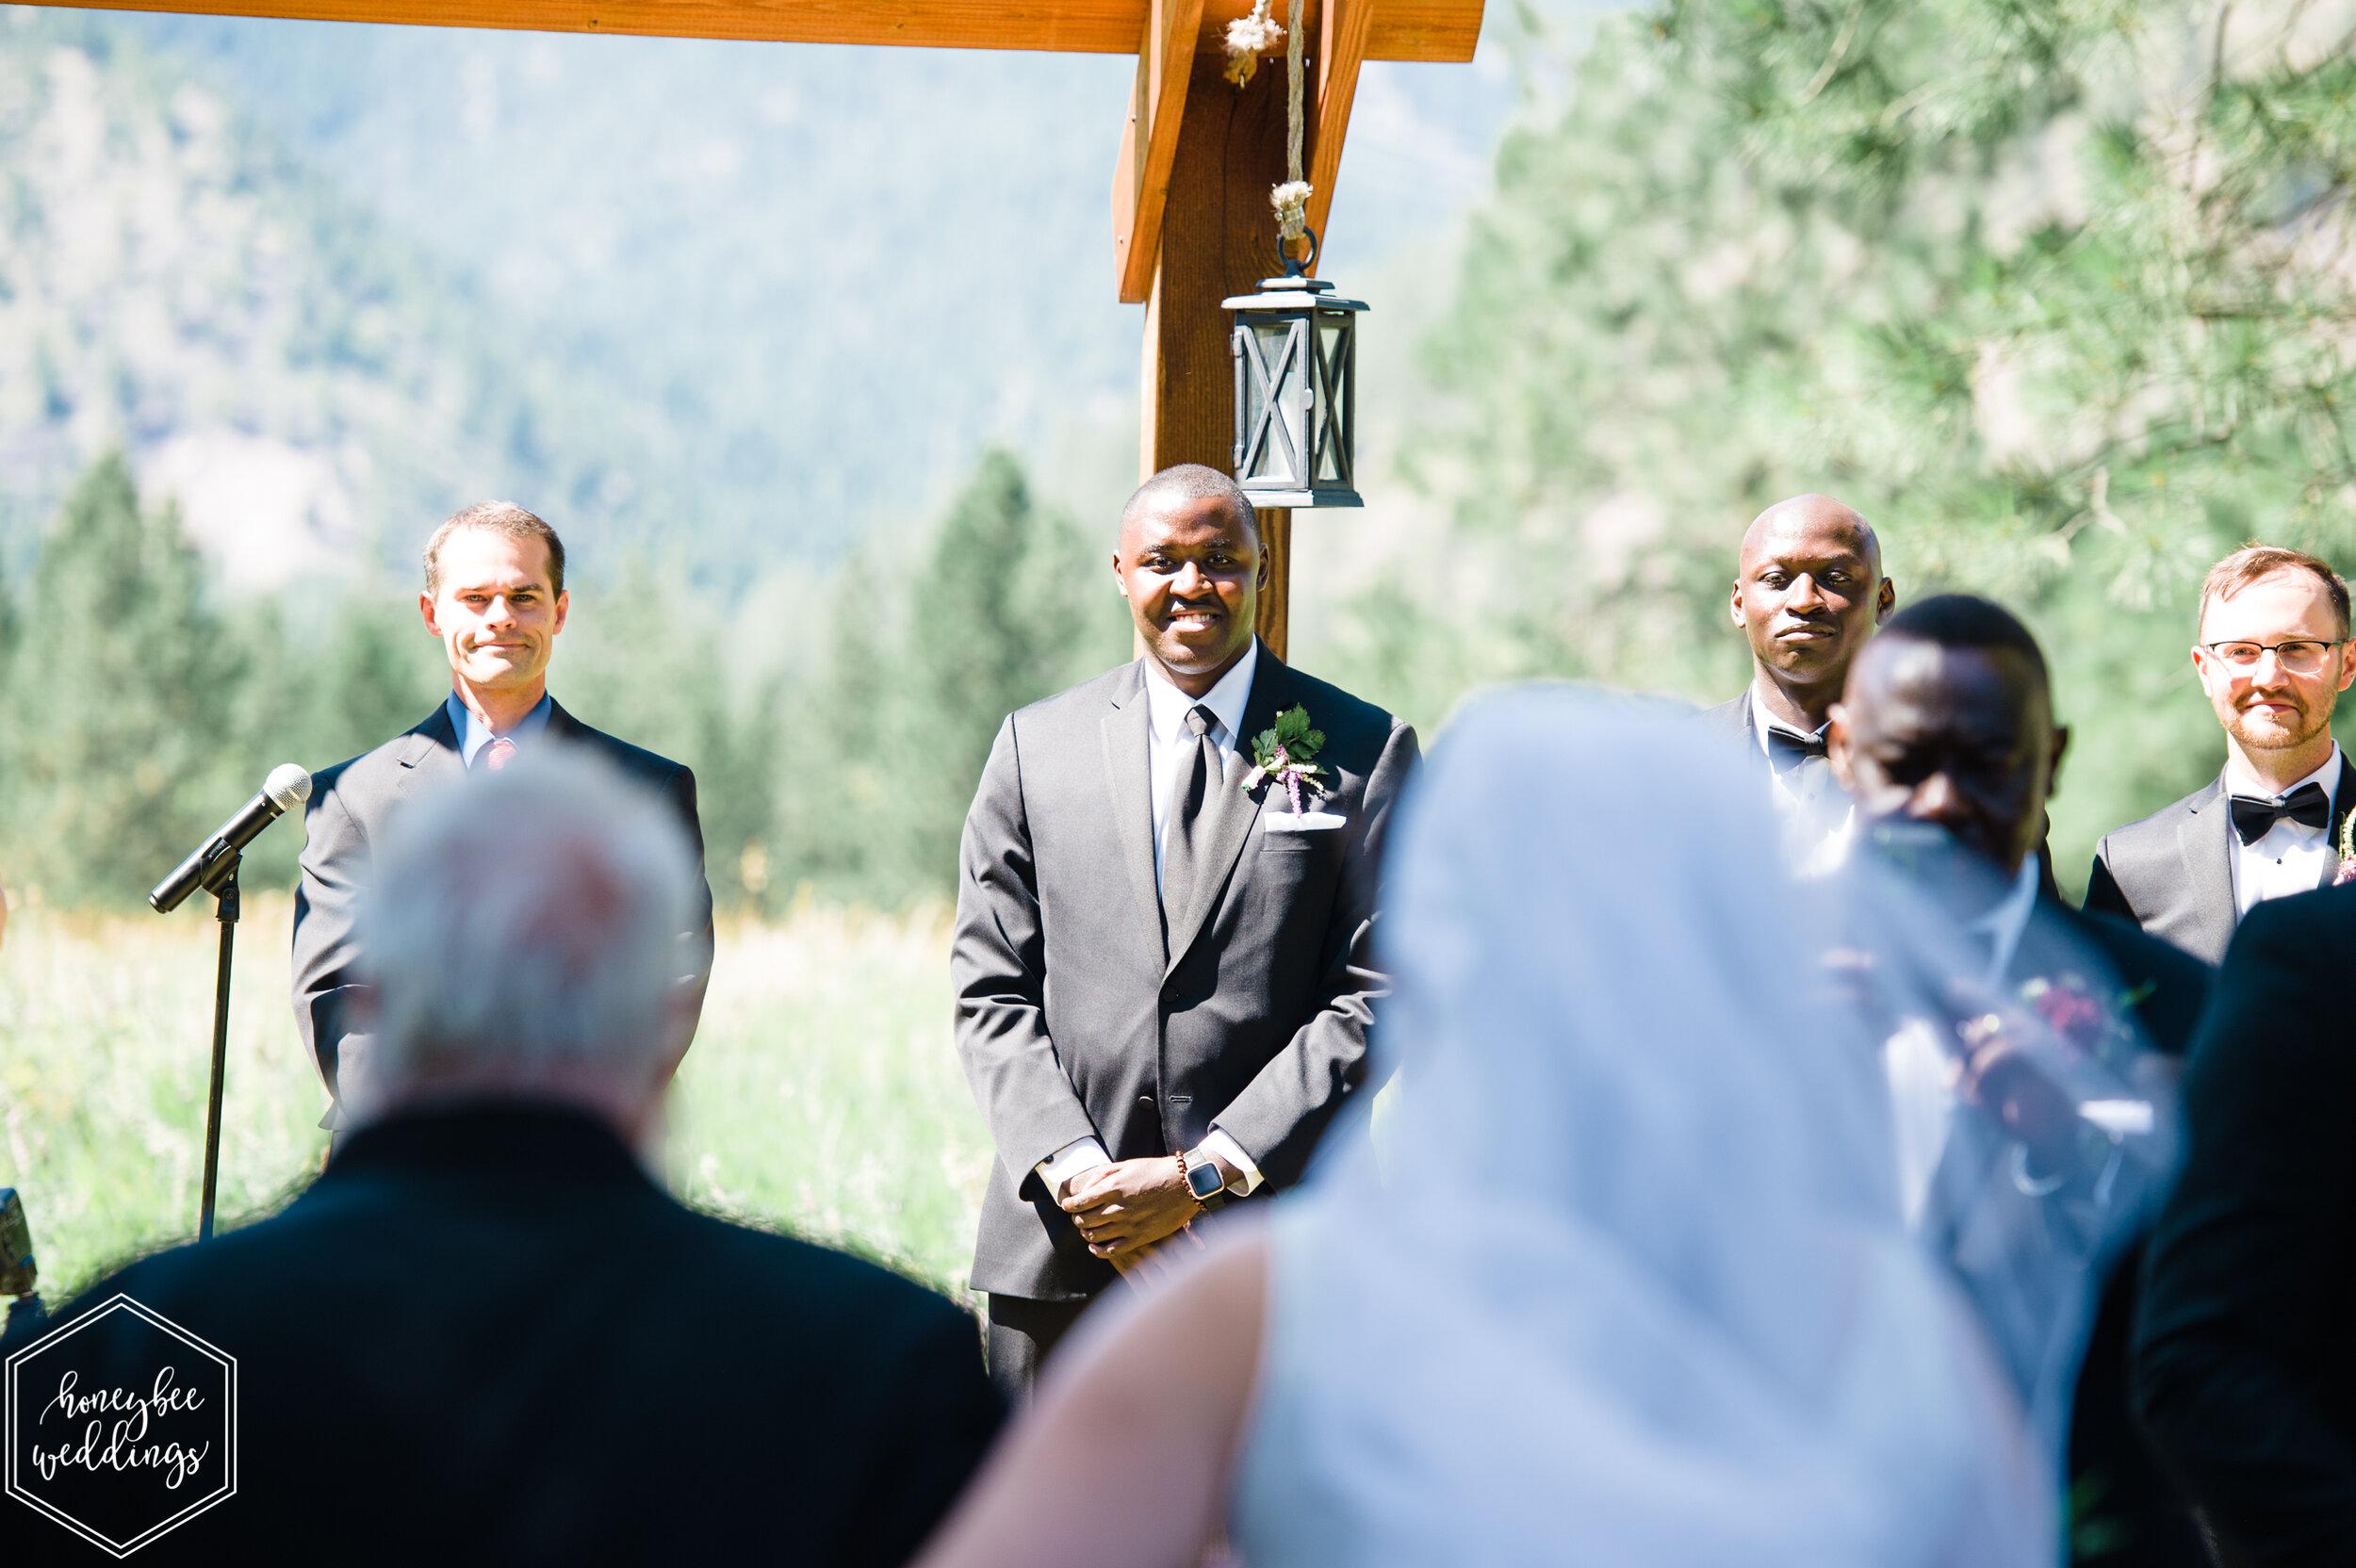 046White Raven Wedding_Montana Wedding Photographer_Rebekah & Likom_Honeybee Weddings_July 27, 2019-338.jpg